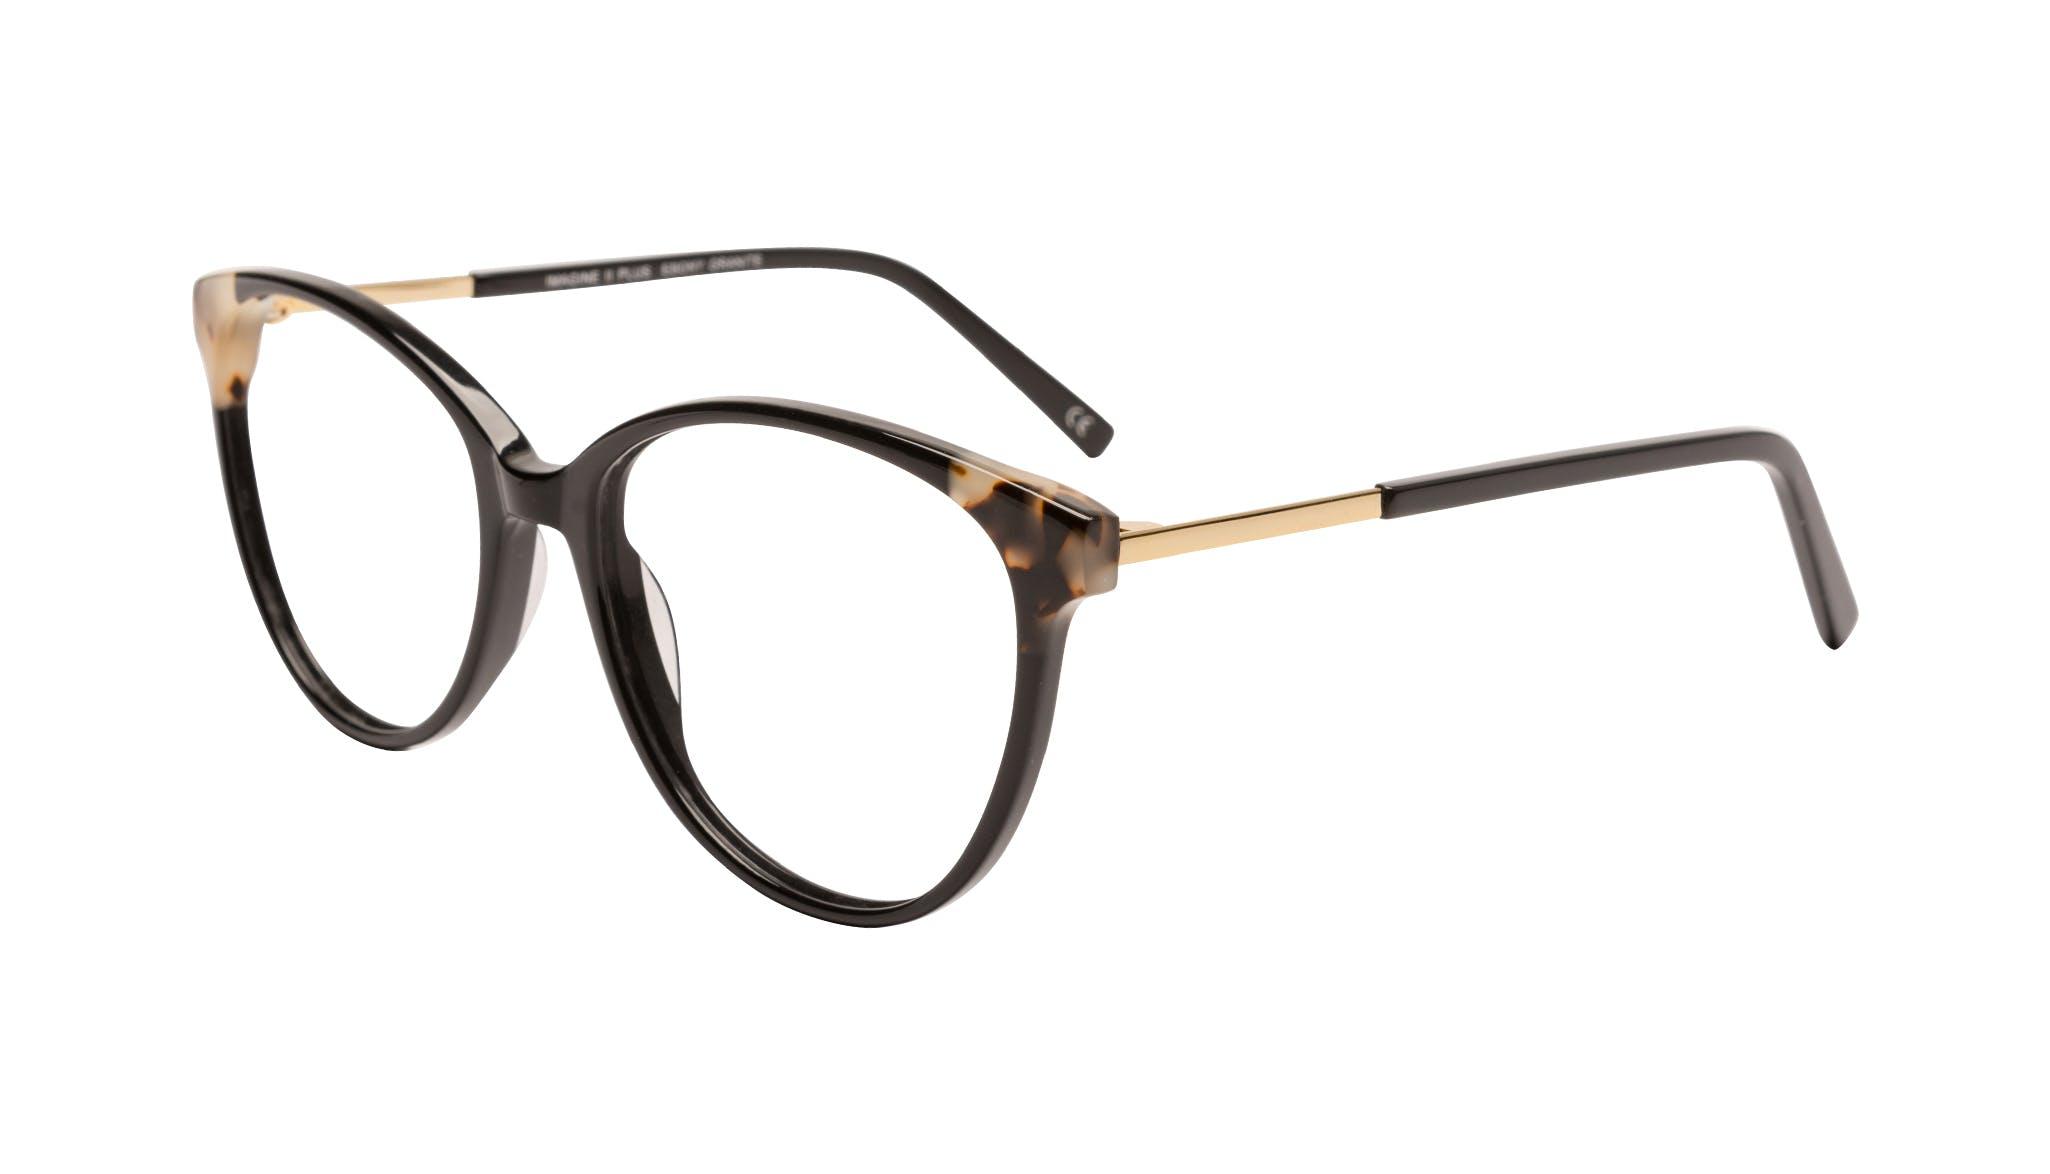 Affordable Fashion Glasses Cat Eye Eyeglasses Women Imagine II Plus Ebony Granite Tilt